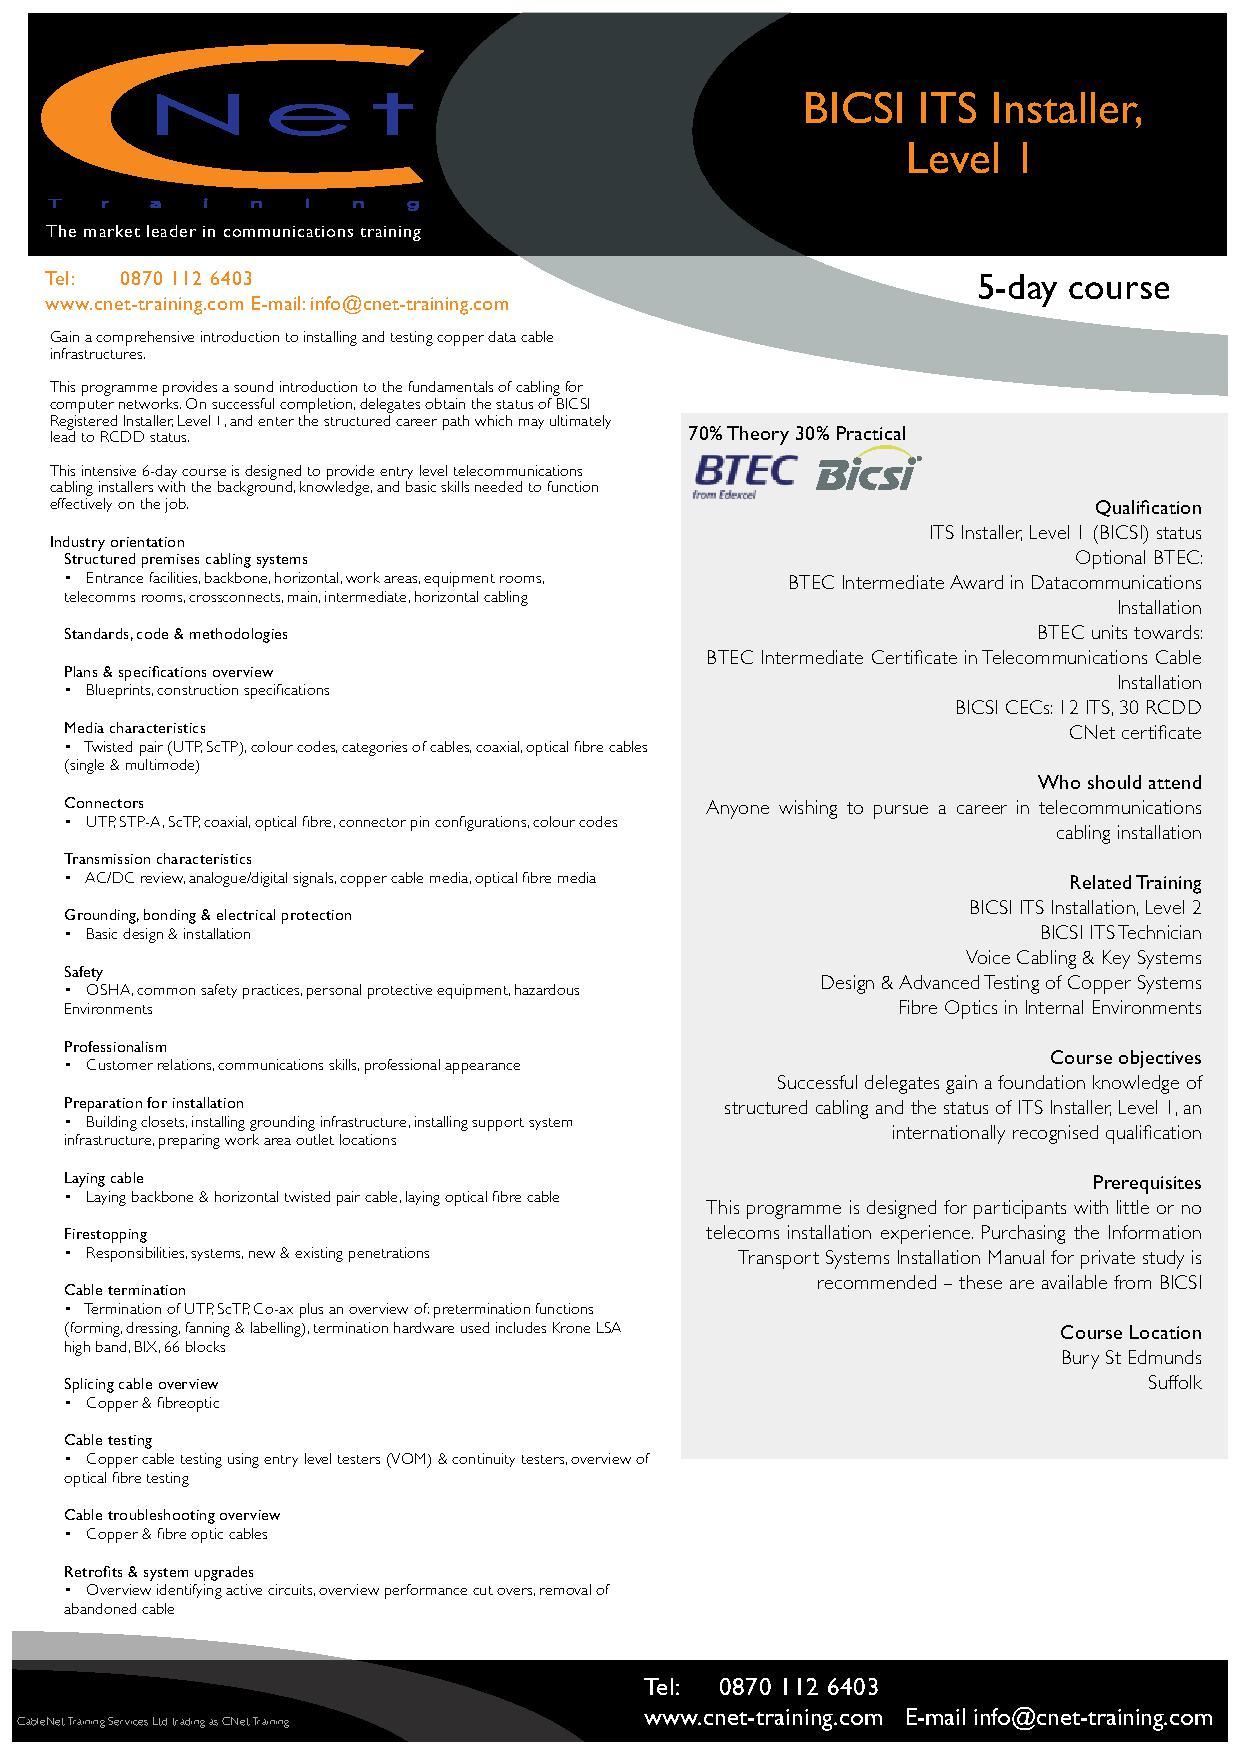 proimages/Training_Courses/BICSI_ITS_Installer_Level_1_1.jpg